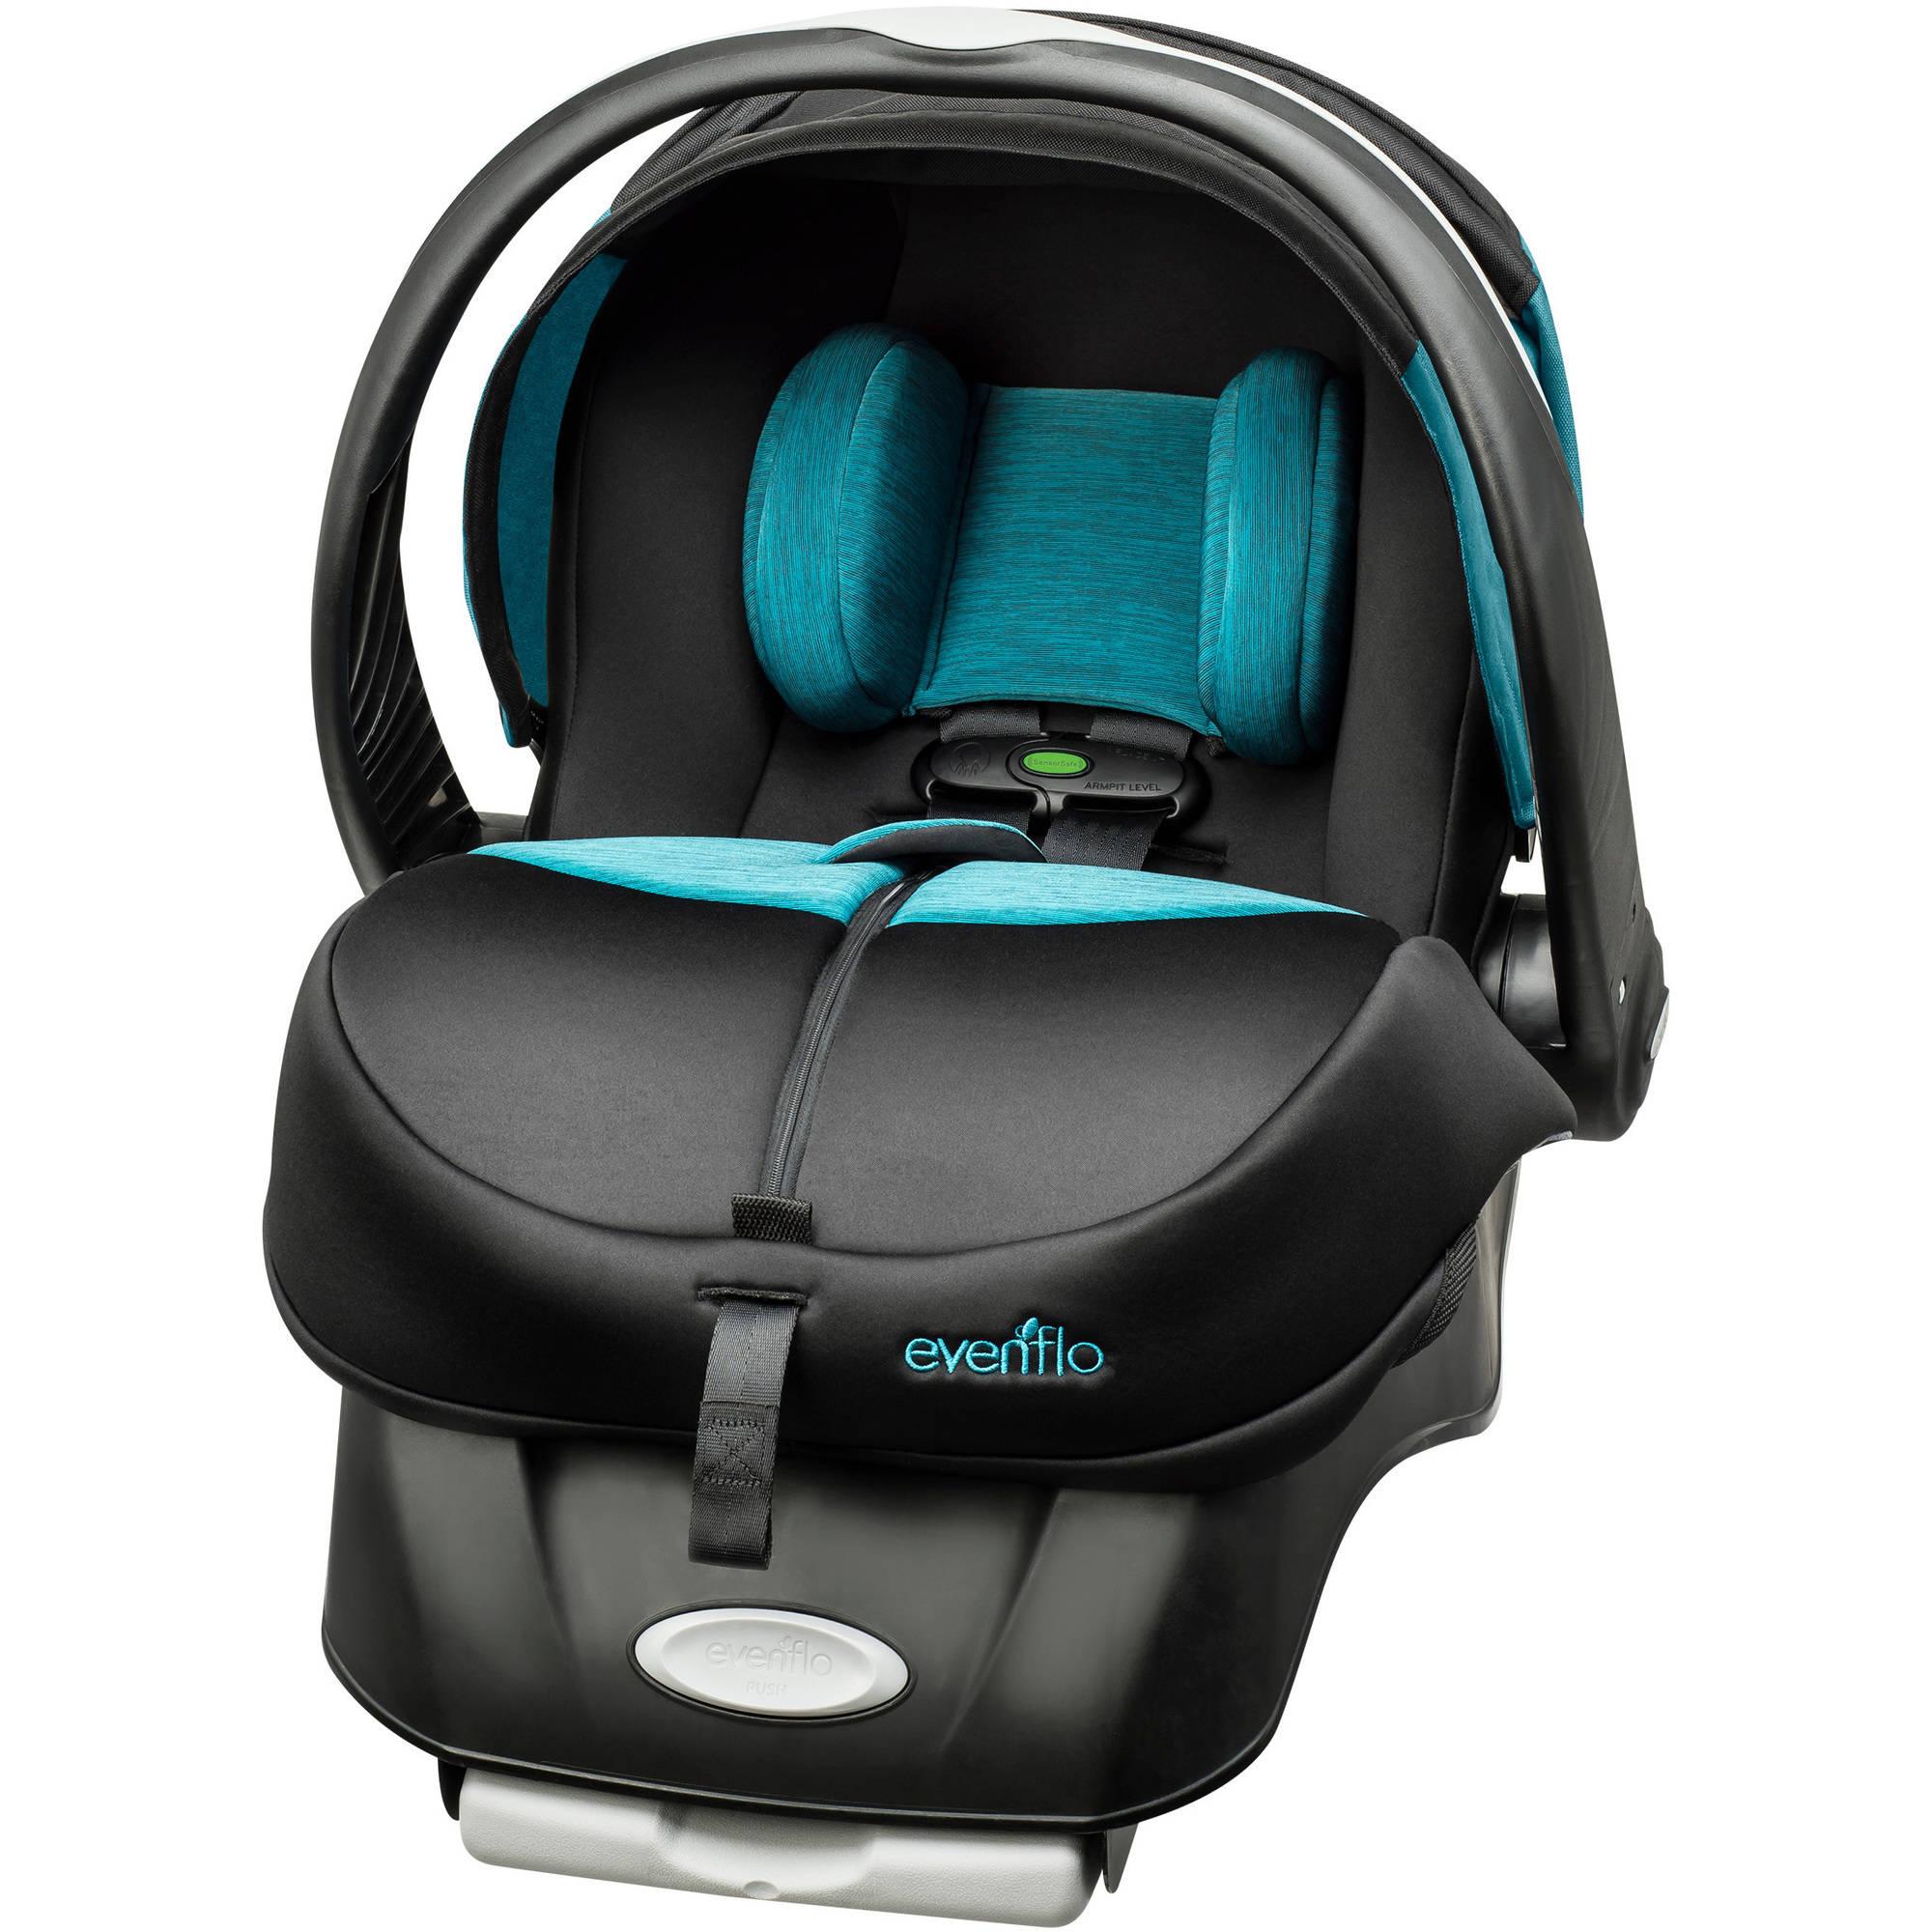 Evenflo Advanced Embrace DLX Infant Car Seat with SensorSafe, Largo